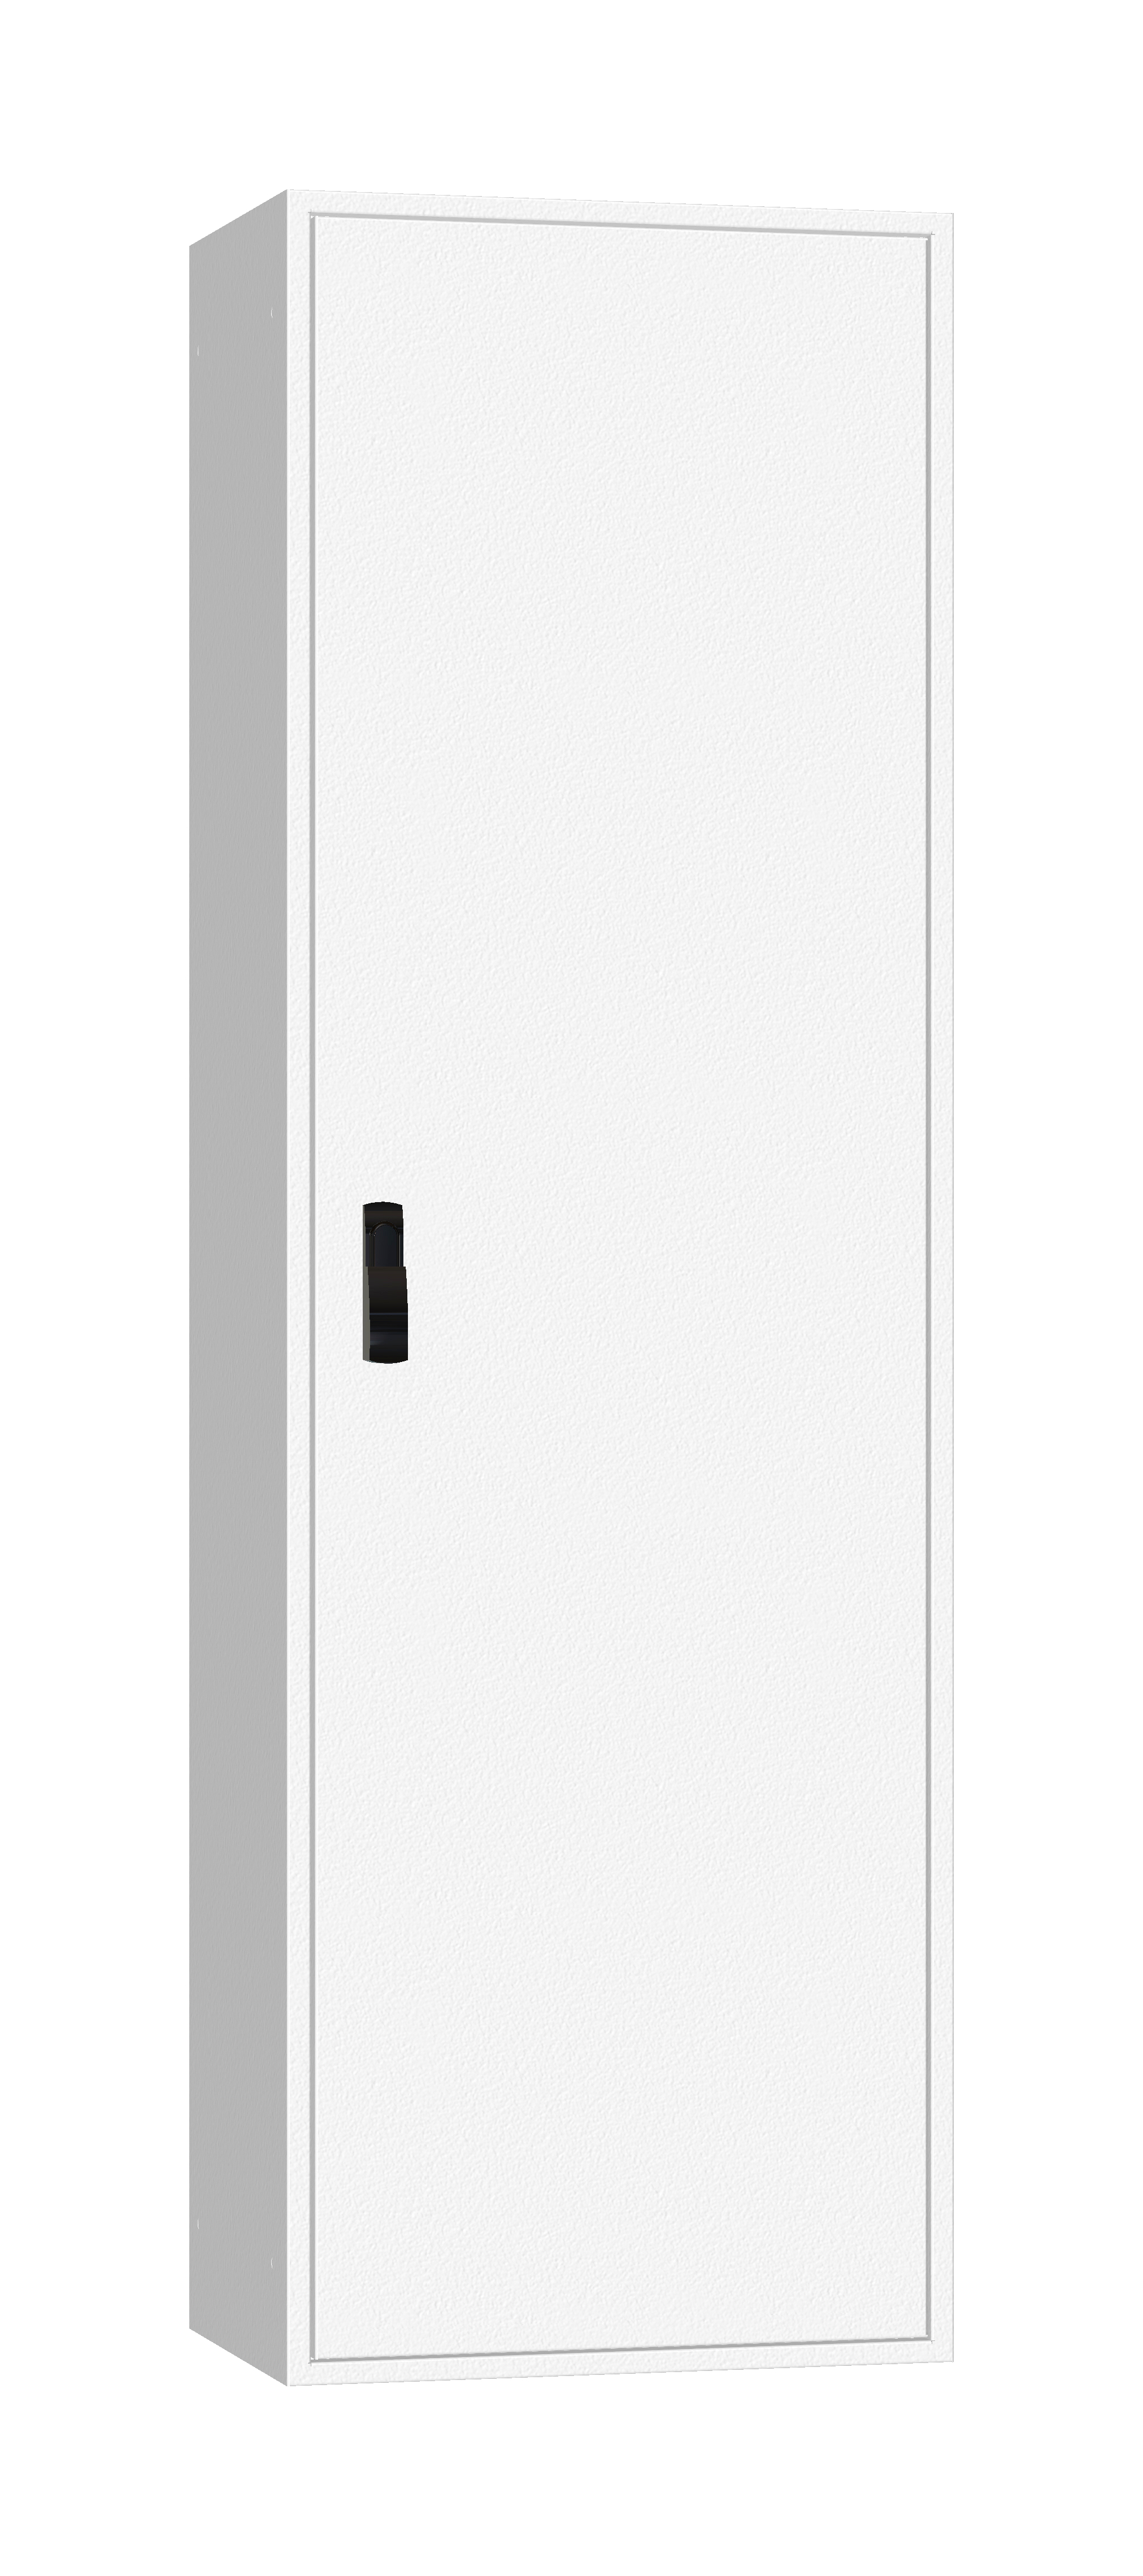 1 Stk AP-Rahmen + Tür 2A-39 T=400mm, Rückwand + Schwenkhebel, IP54 IL954239--